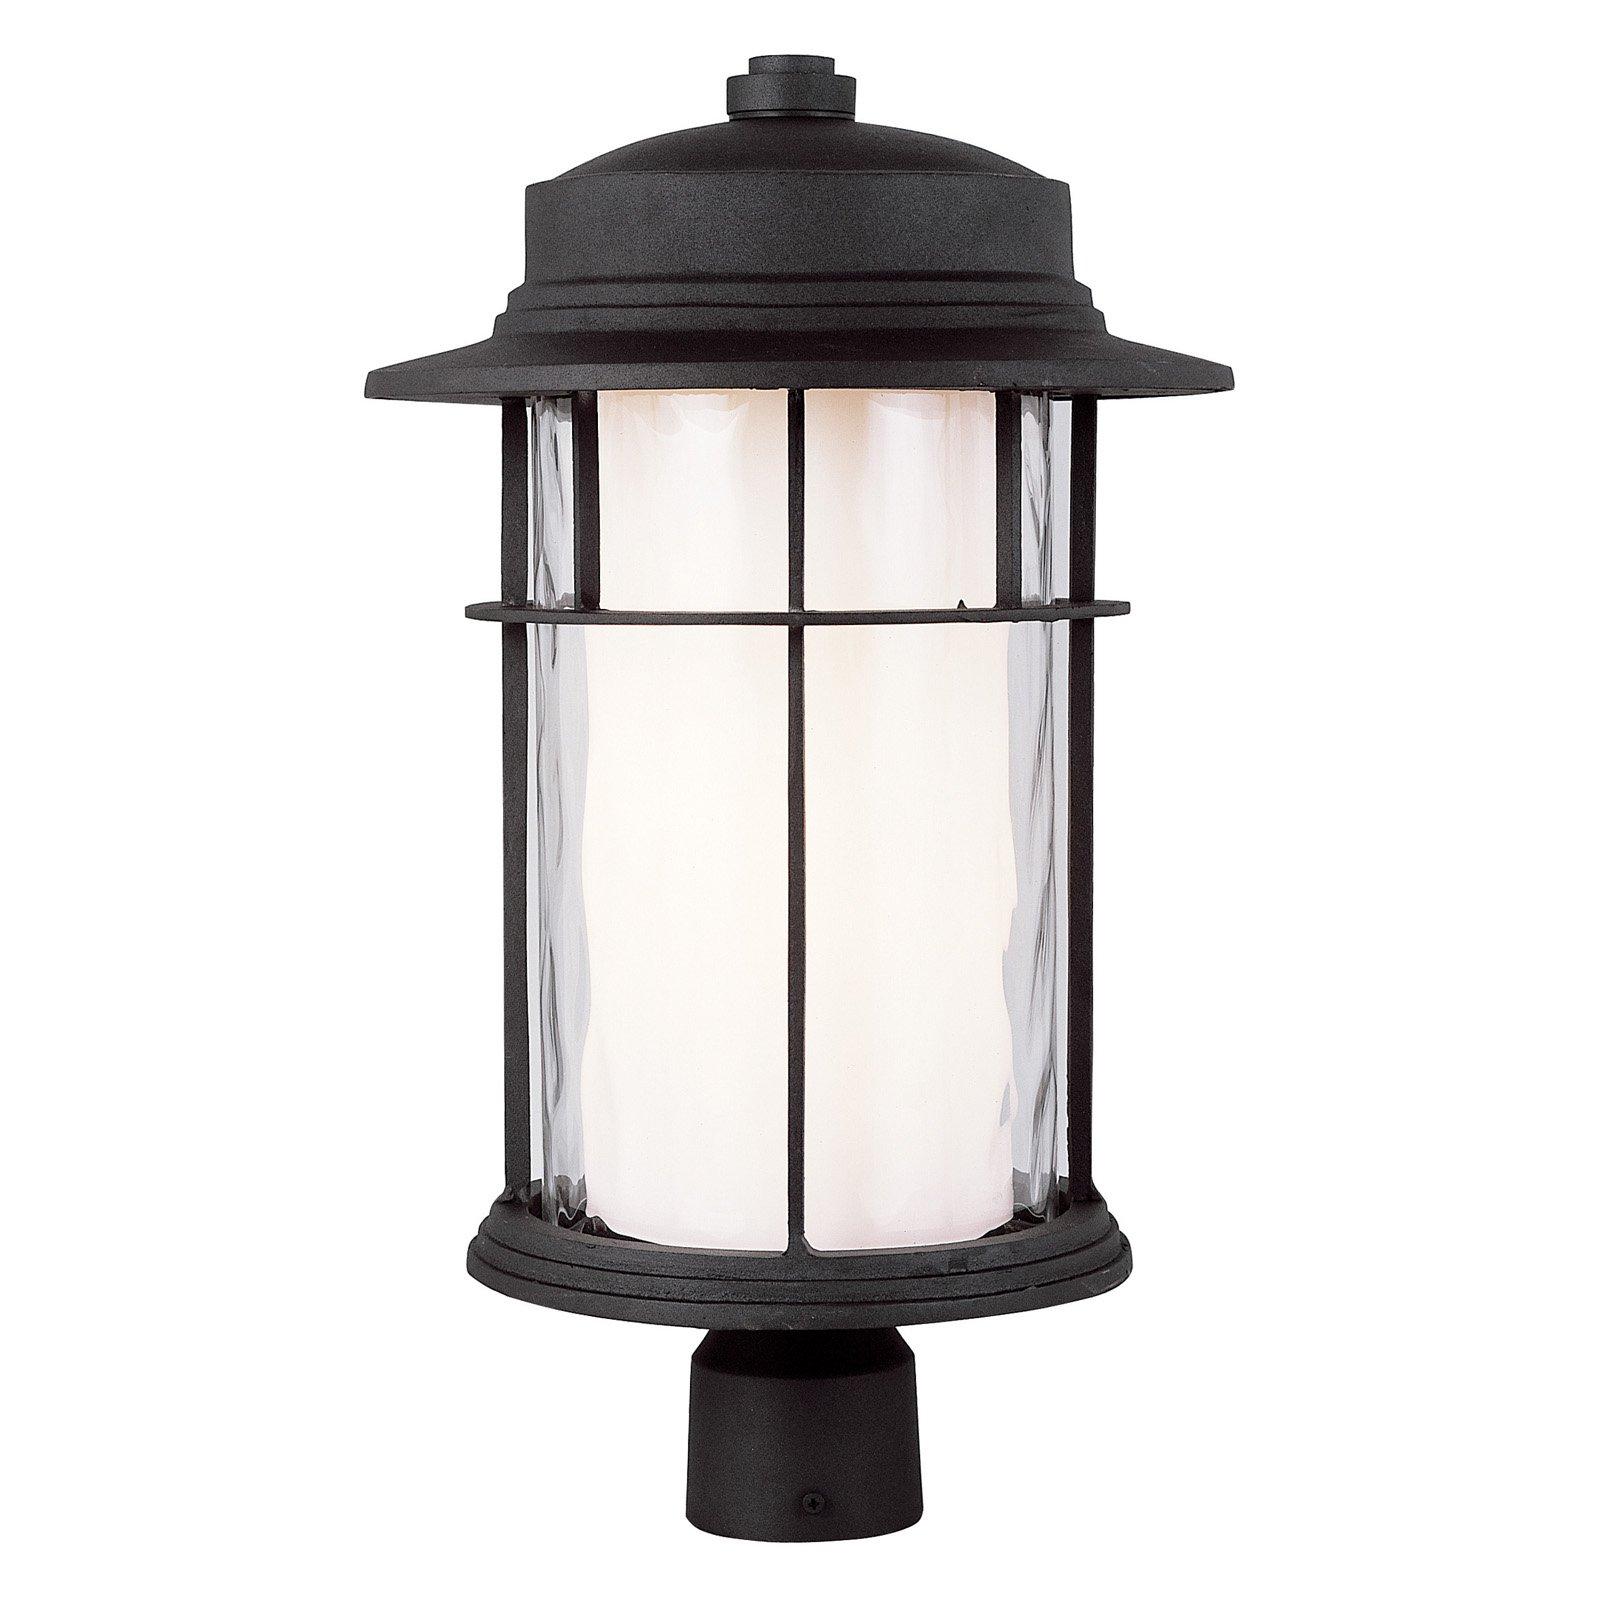 Trans Globe 5296 Post Lantern - 12W in. - Rust